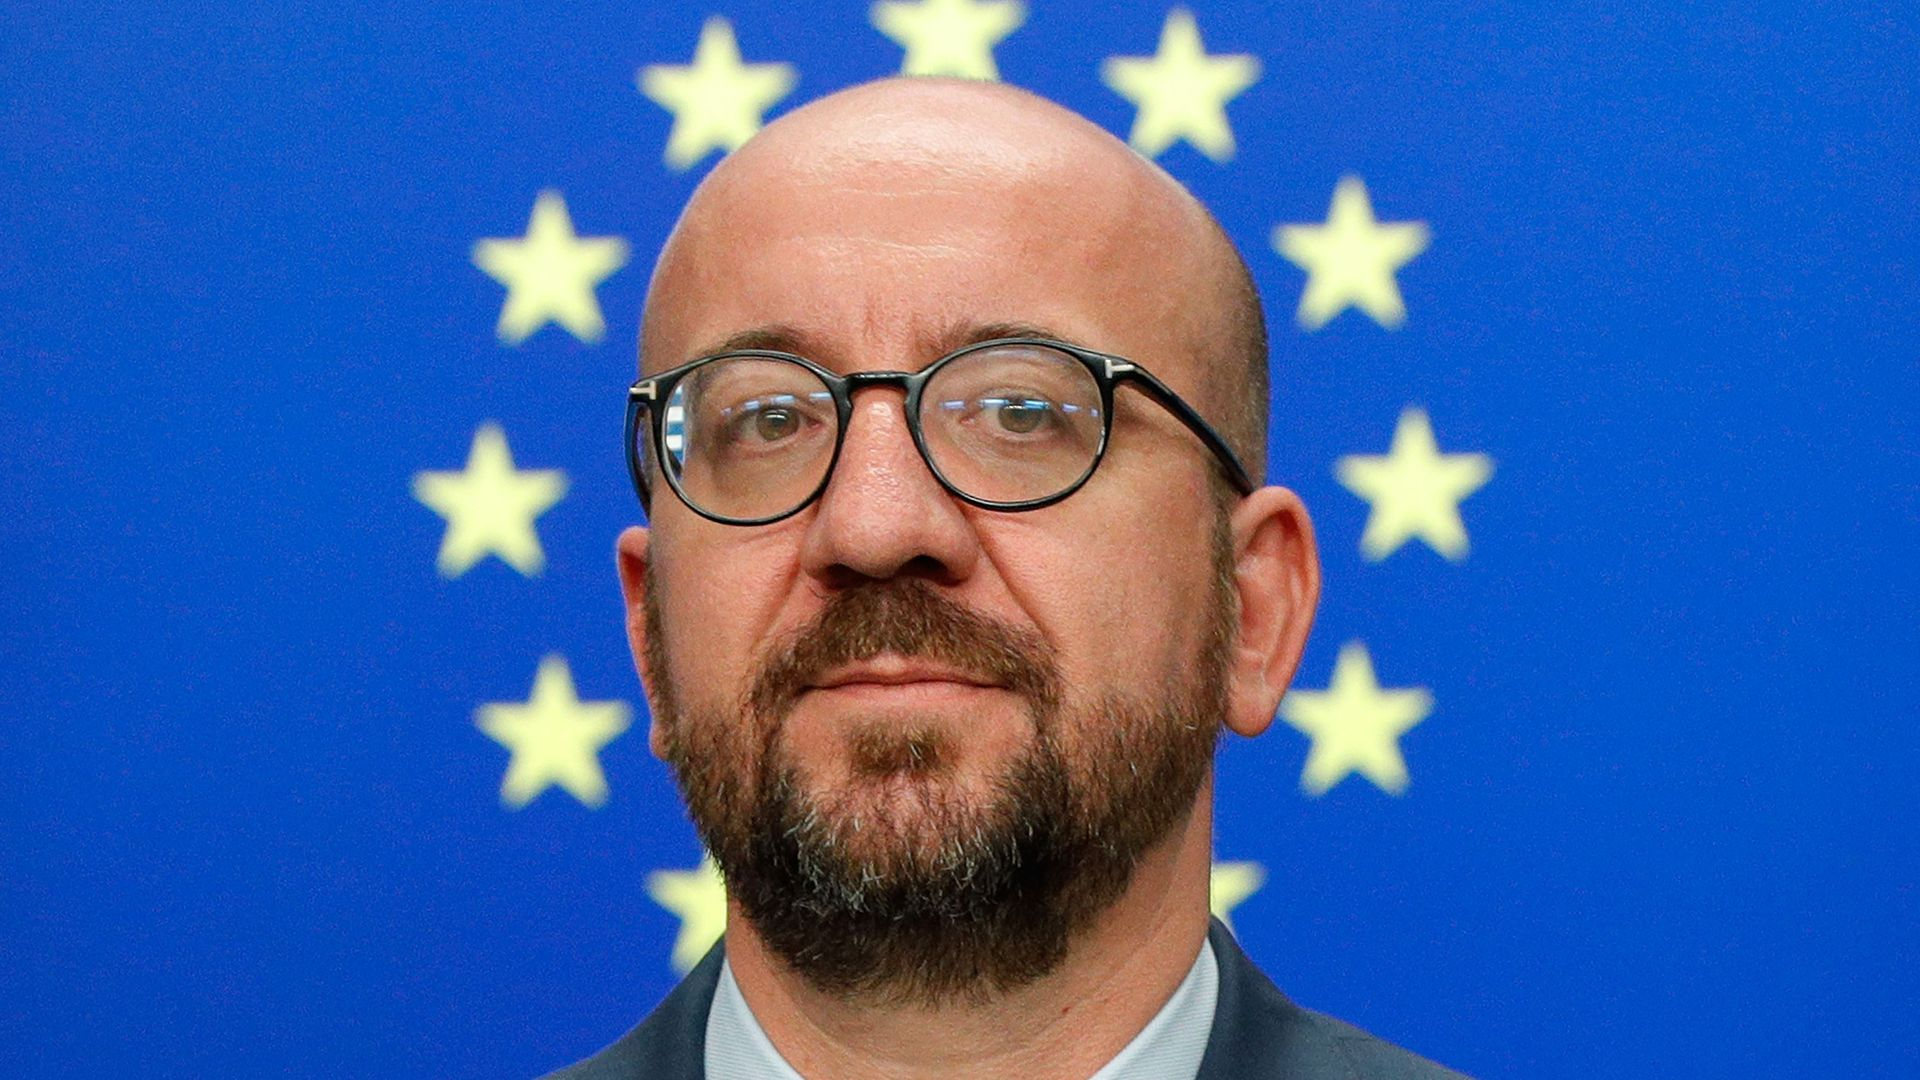 Charles Michel, the EU Council president - Credit: GEOFFROY VAN DER HASSELT/AFP